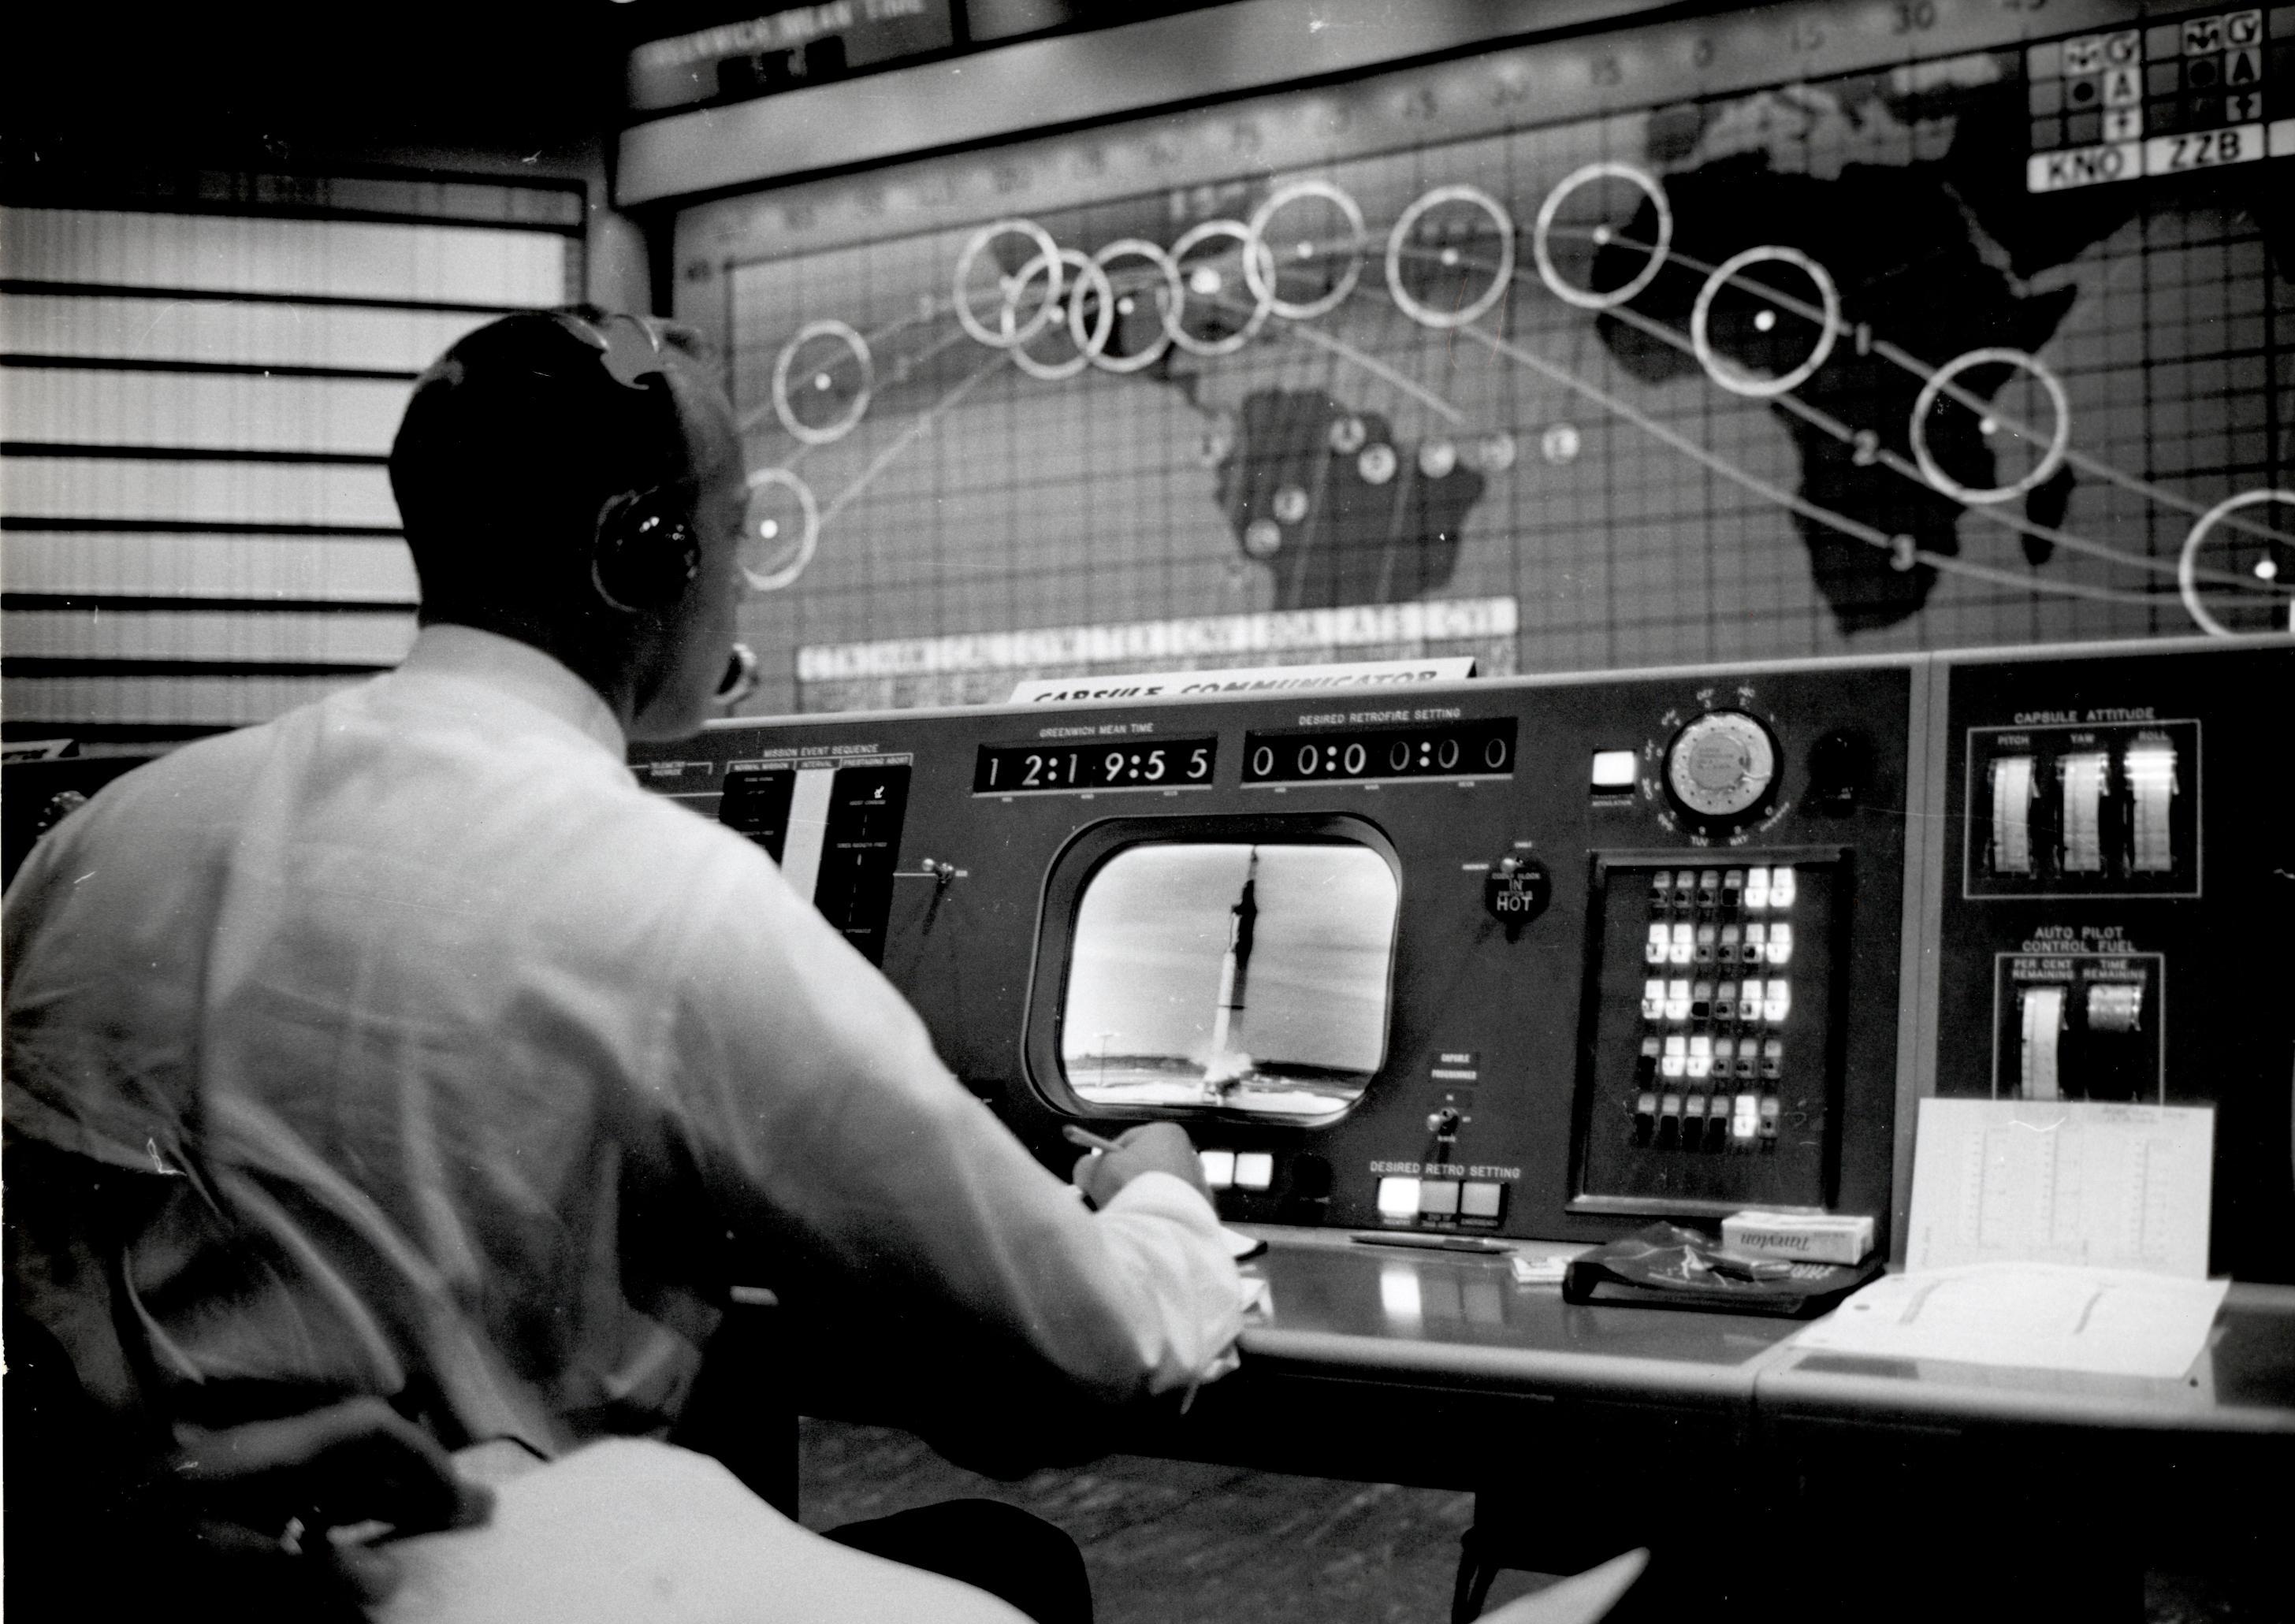 control flight center credits NASA